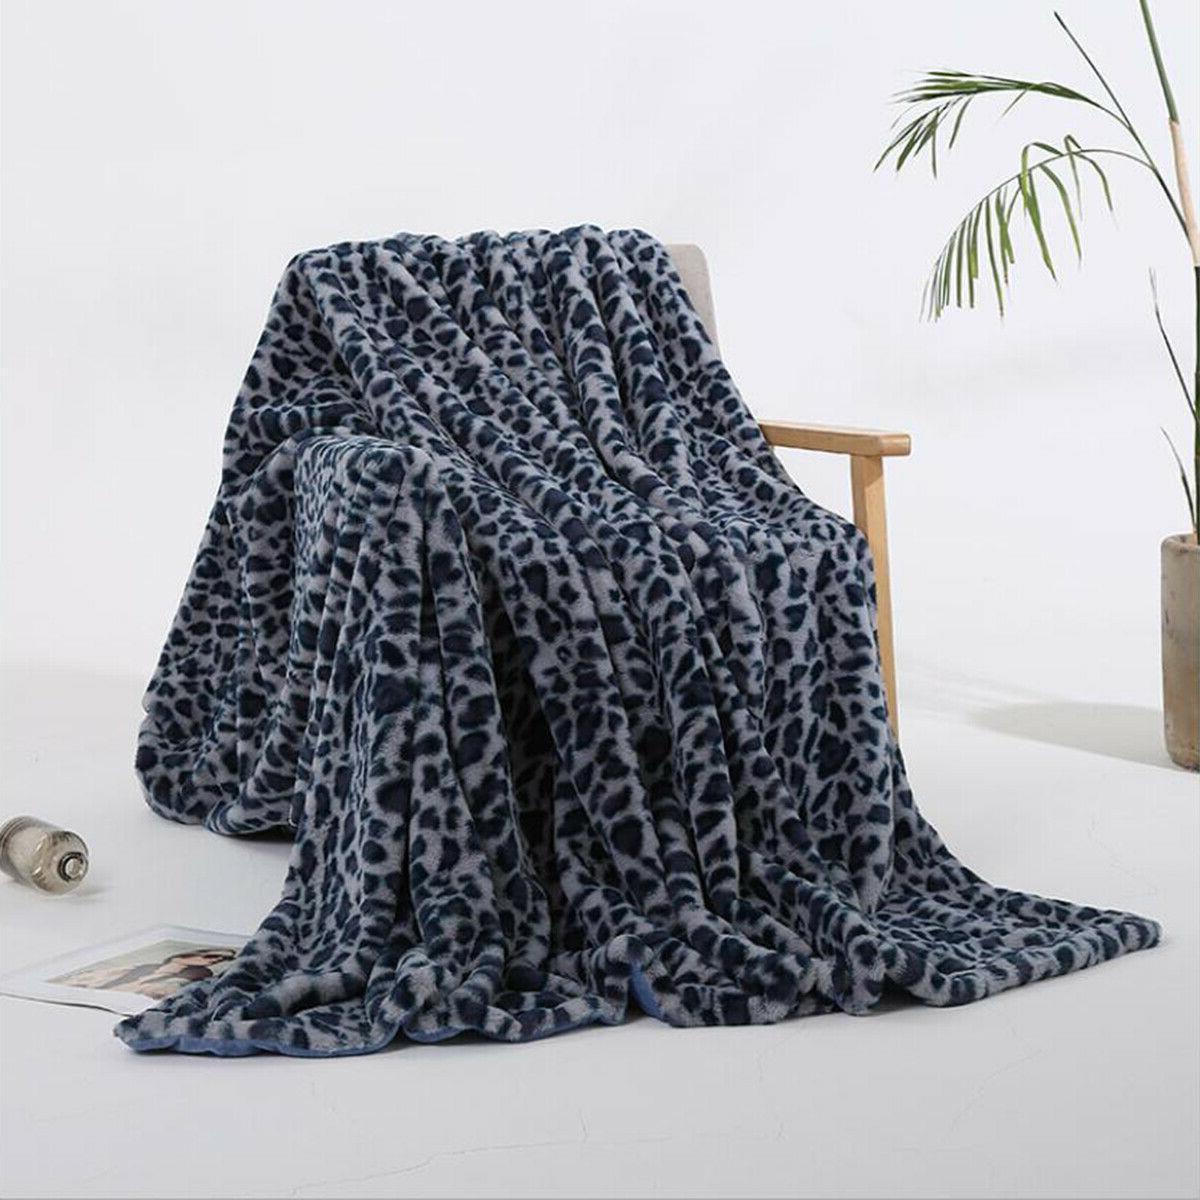 Leopard Print Fur Micro Mink Throw Super Plush Fleece